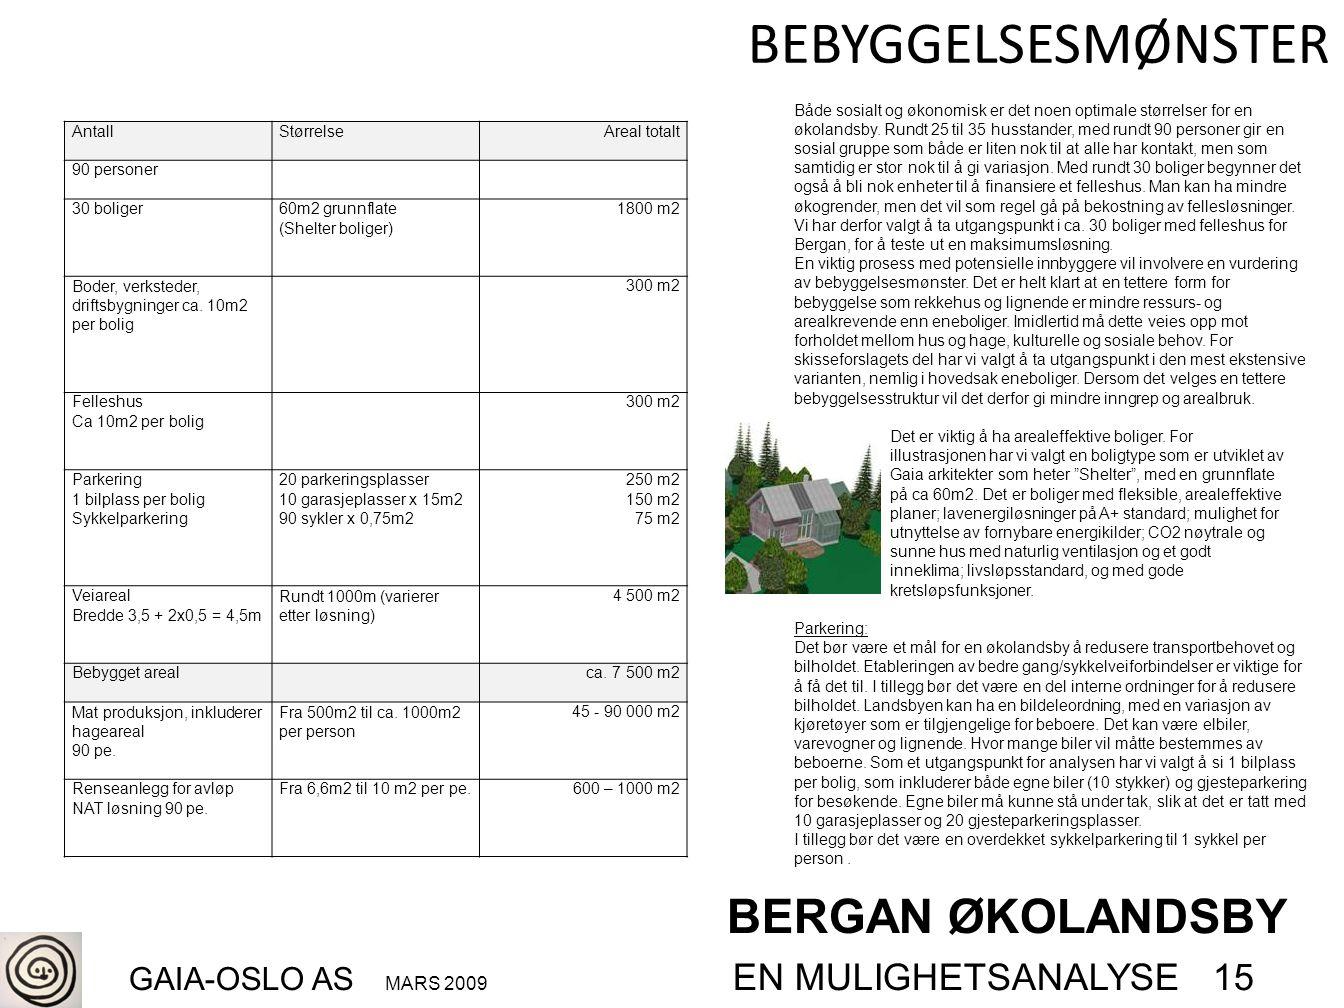 BERGAN ØKOLANDSBY GAIA-OSLO AS MARS 2009 EN MULIGHETSANALYSE 15